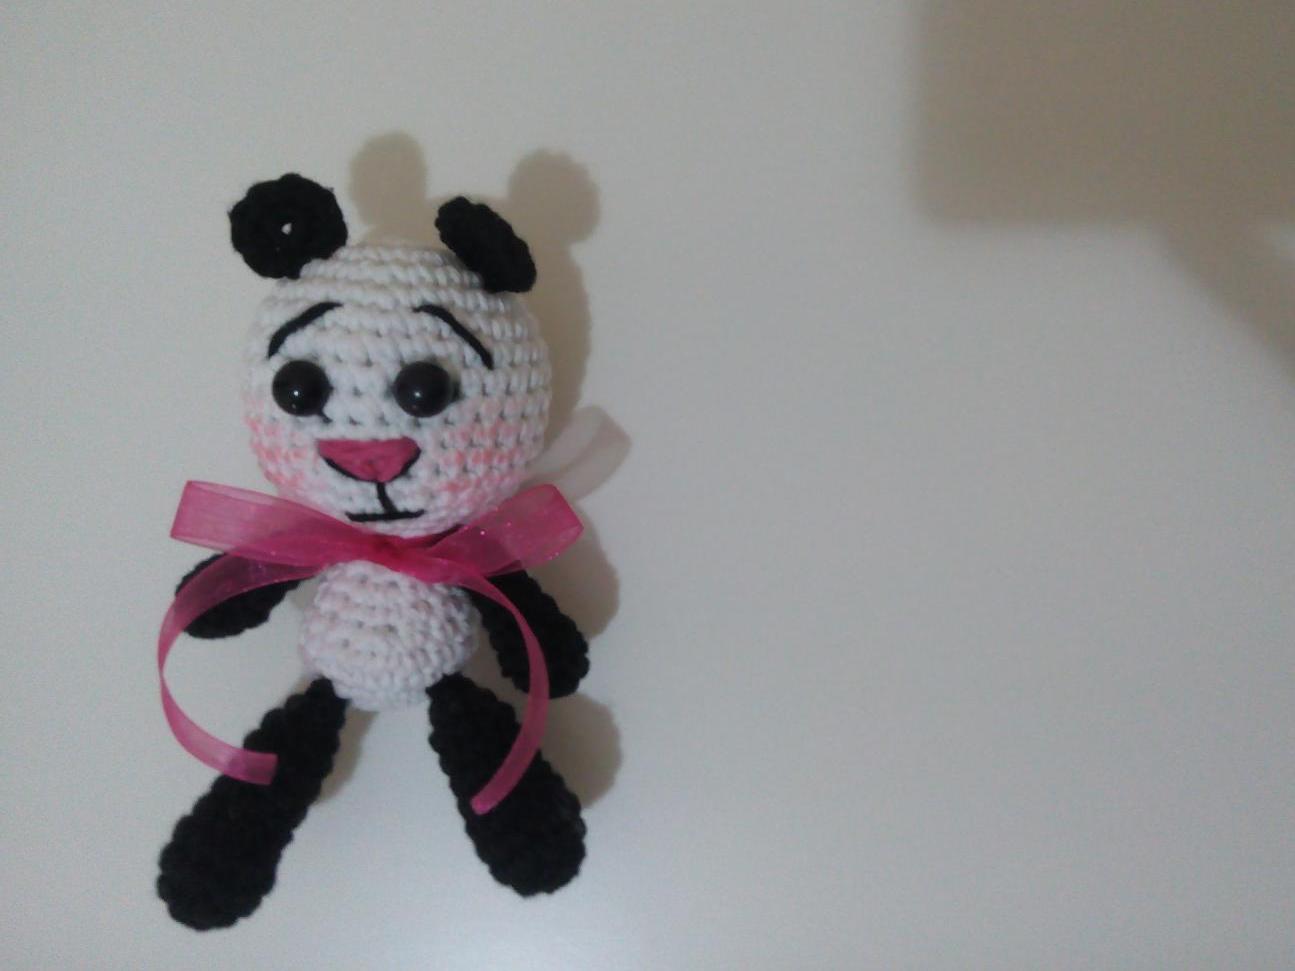 Amigurumi Panda Anahtarlık Tarifi, #Amigurumi #Anahtarlık #Panda ... | 971x1295